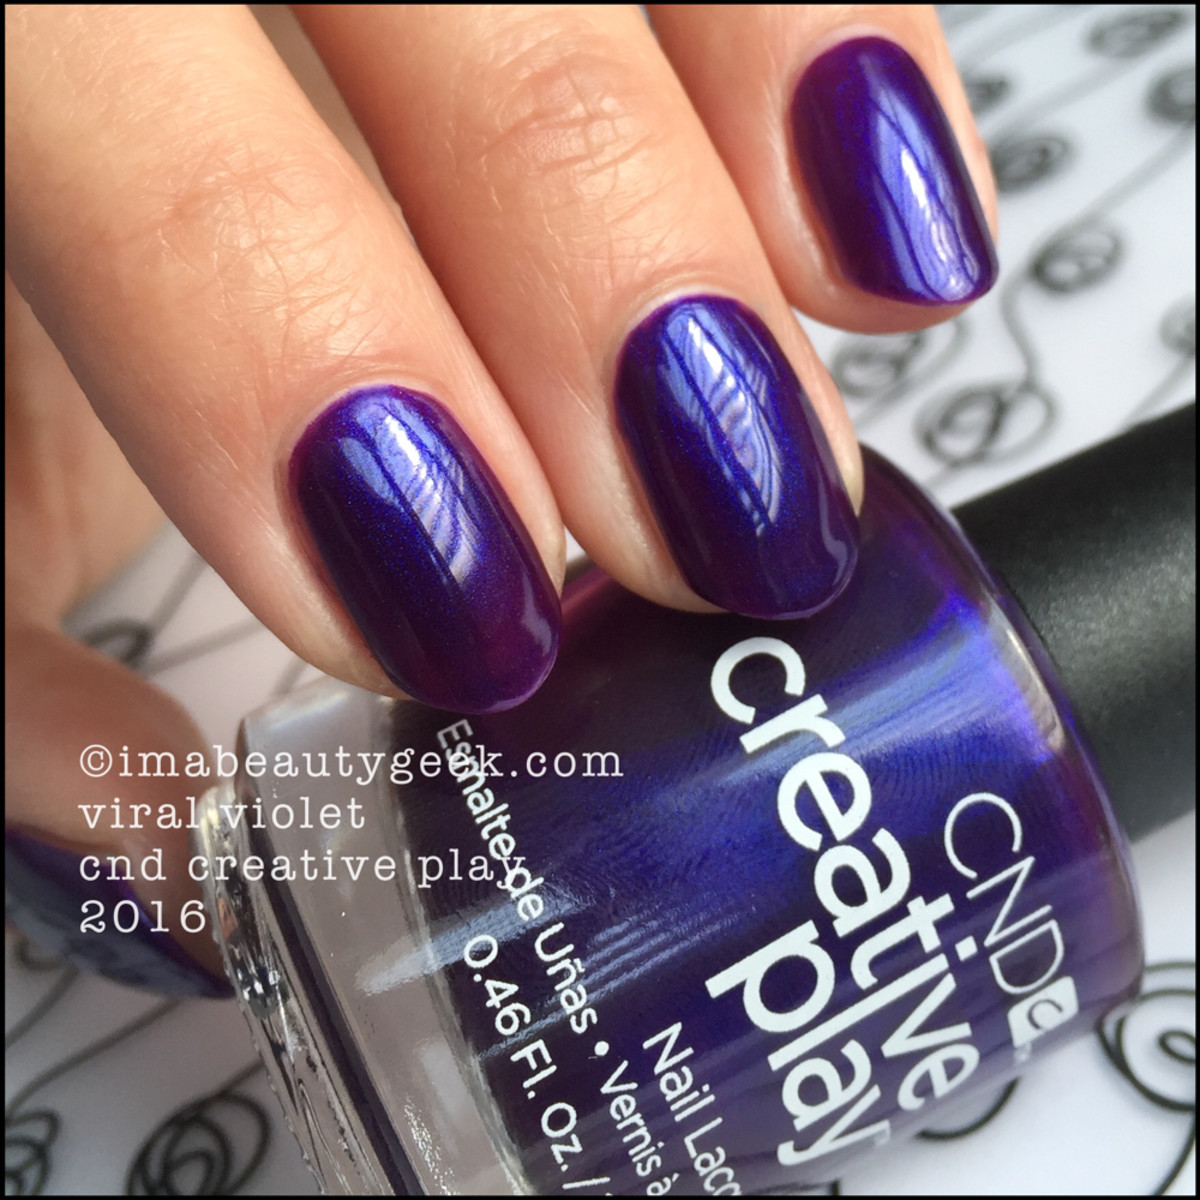 CND Creative Play Viral Violet_CND Creative Play Nail Polish Swatches